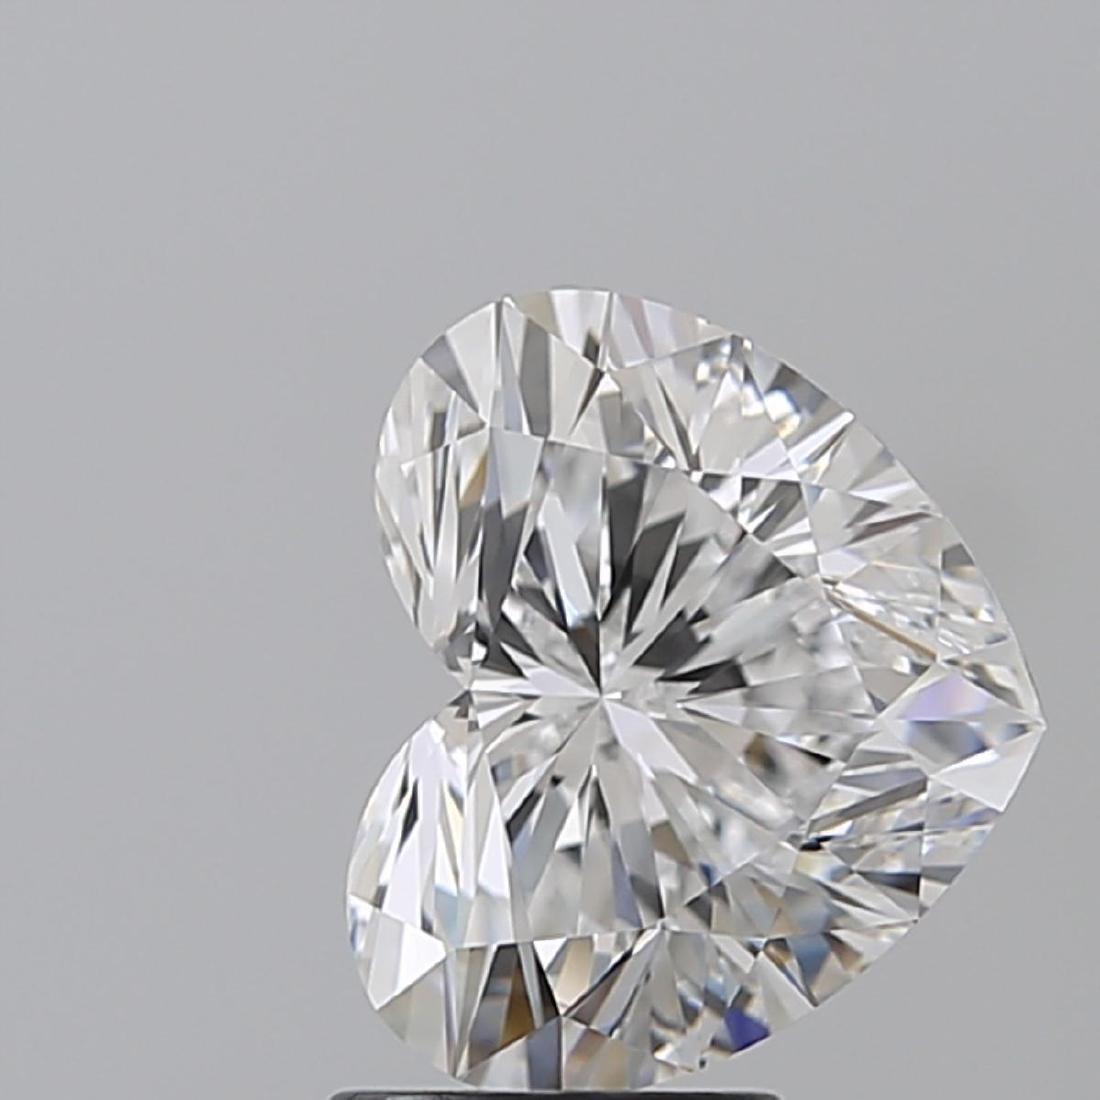 3.01 ct, Color D/IF, Heart cut Diamond - 2